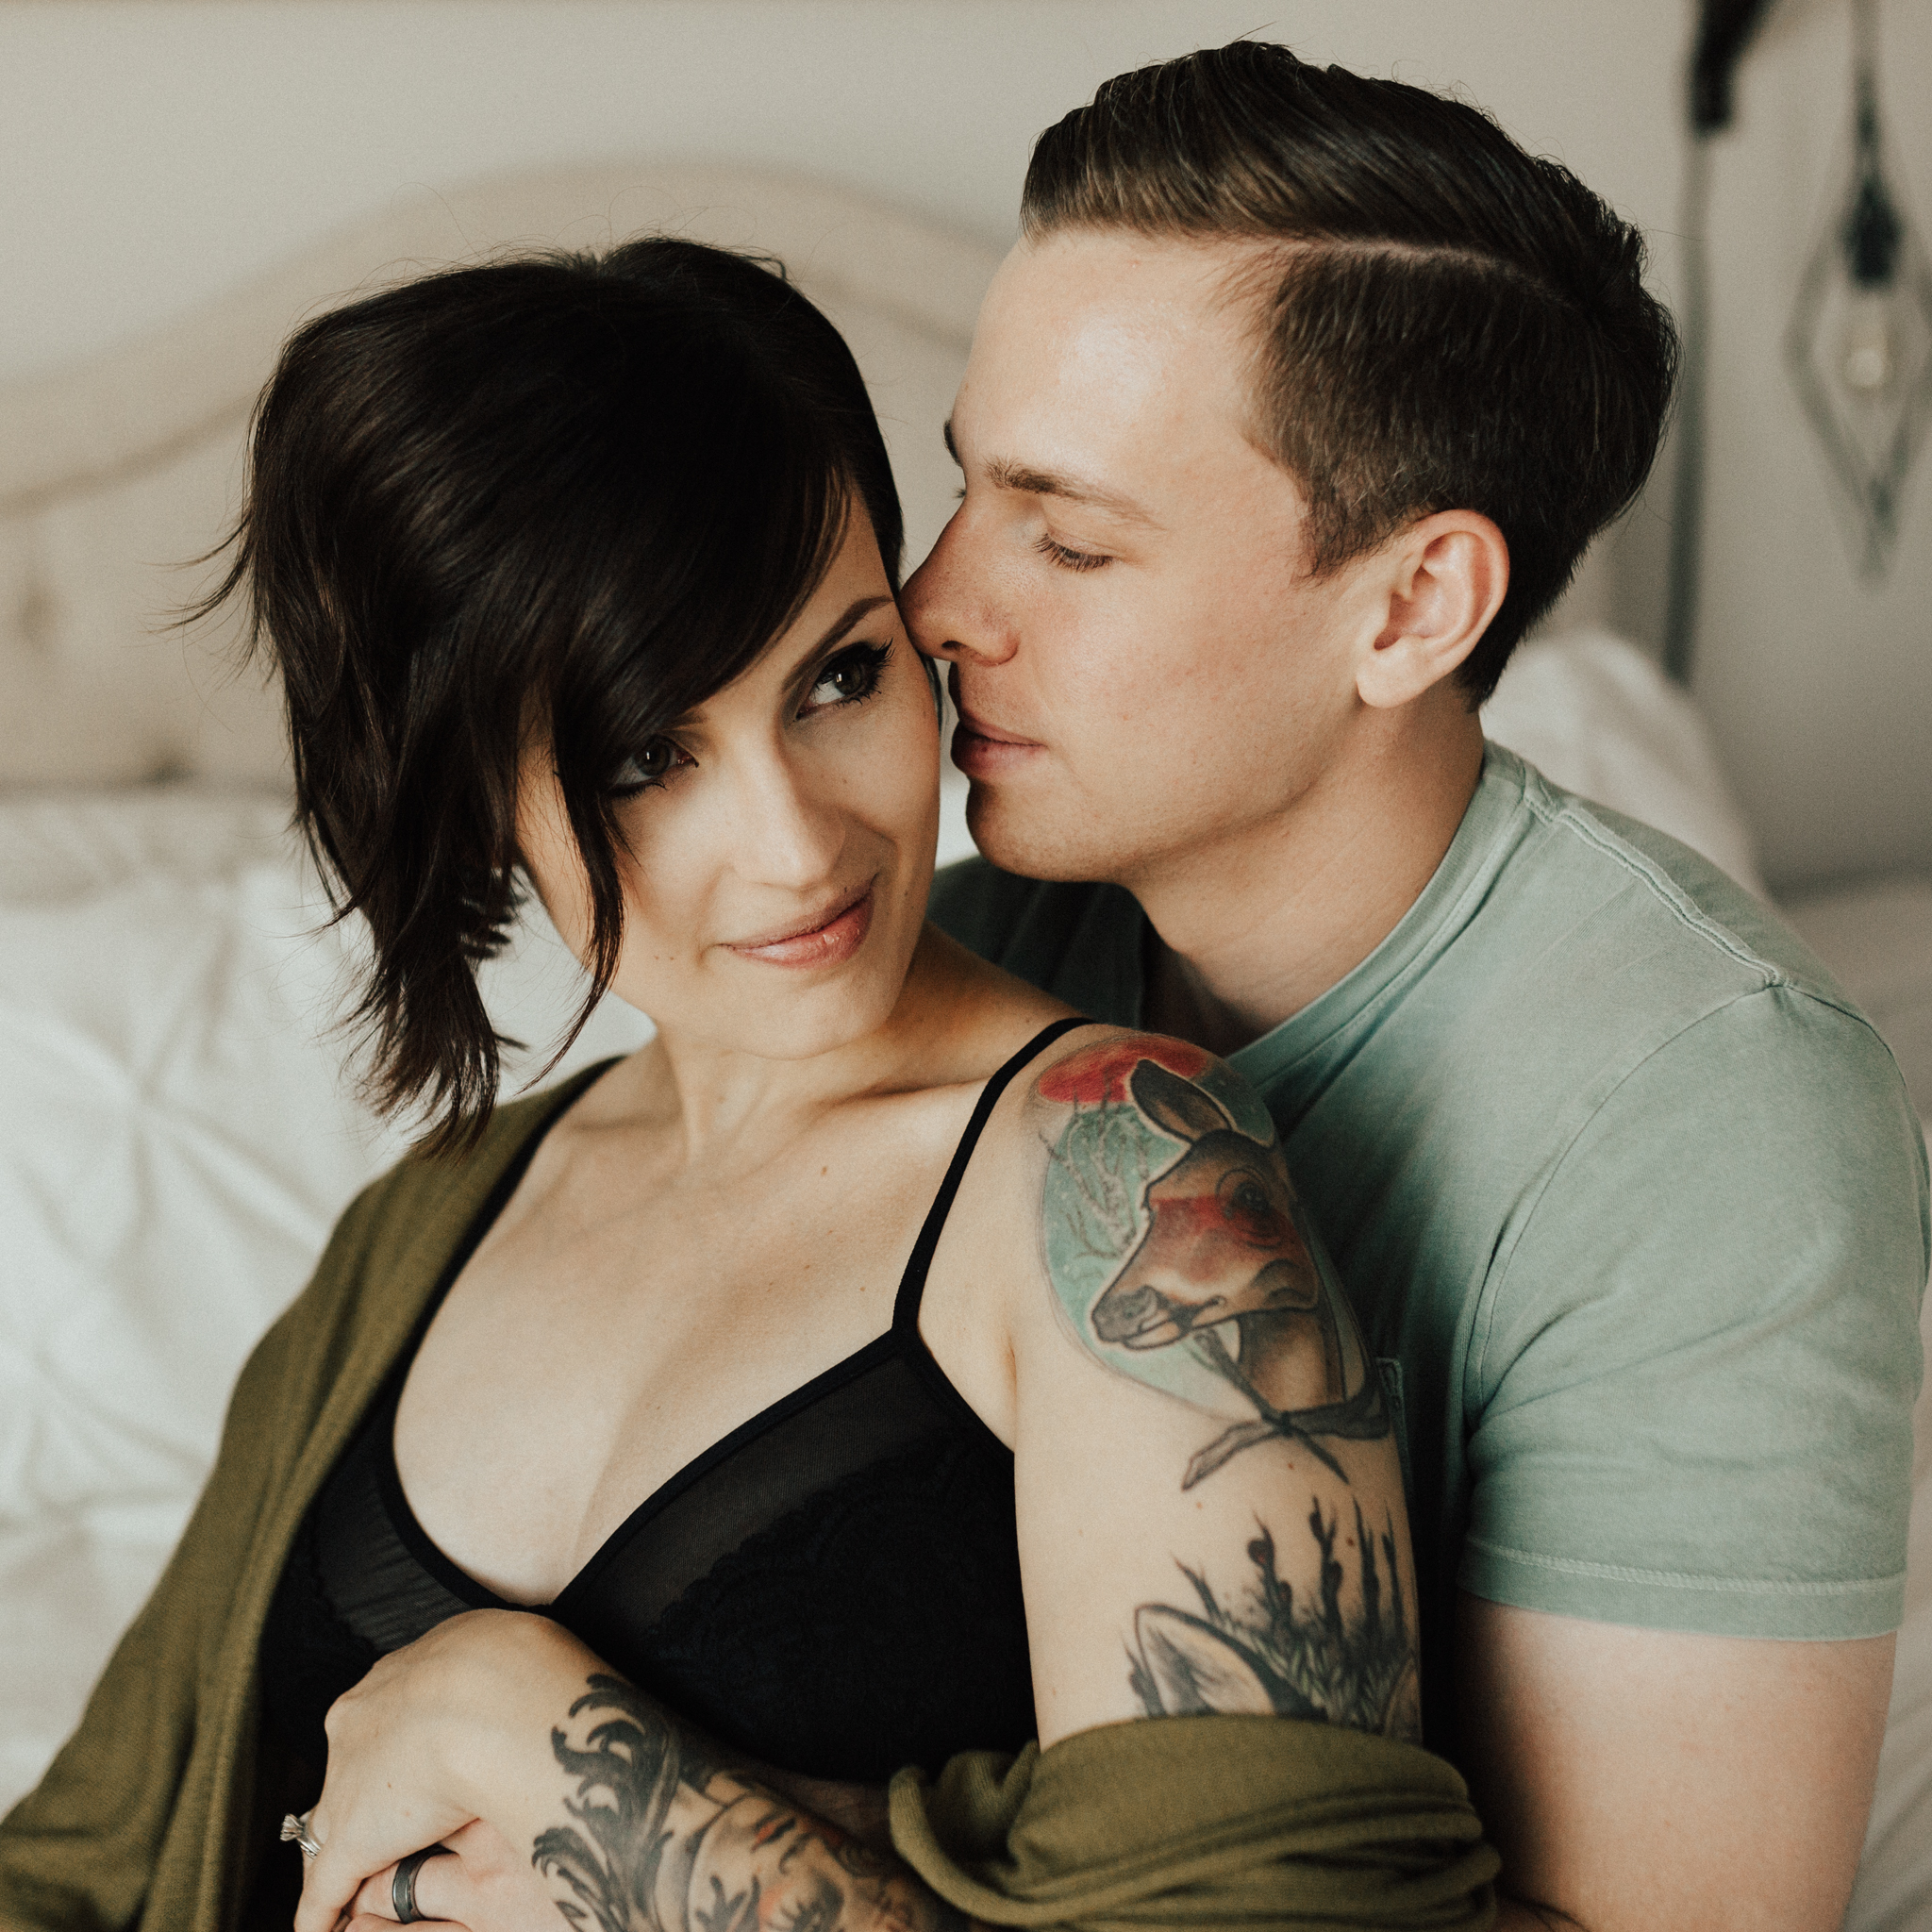 Arizona-Intimate-In-Home-Session-Maternity (9).jpg